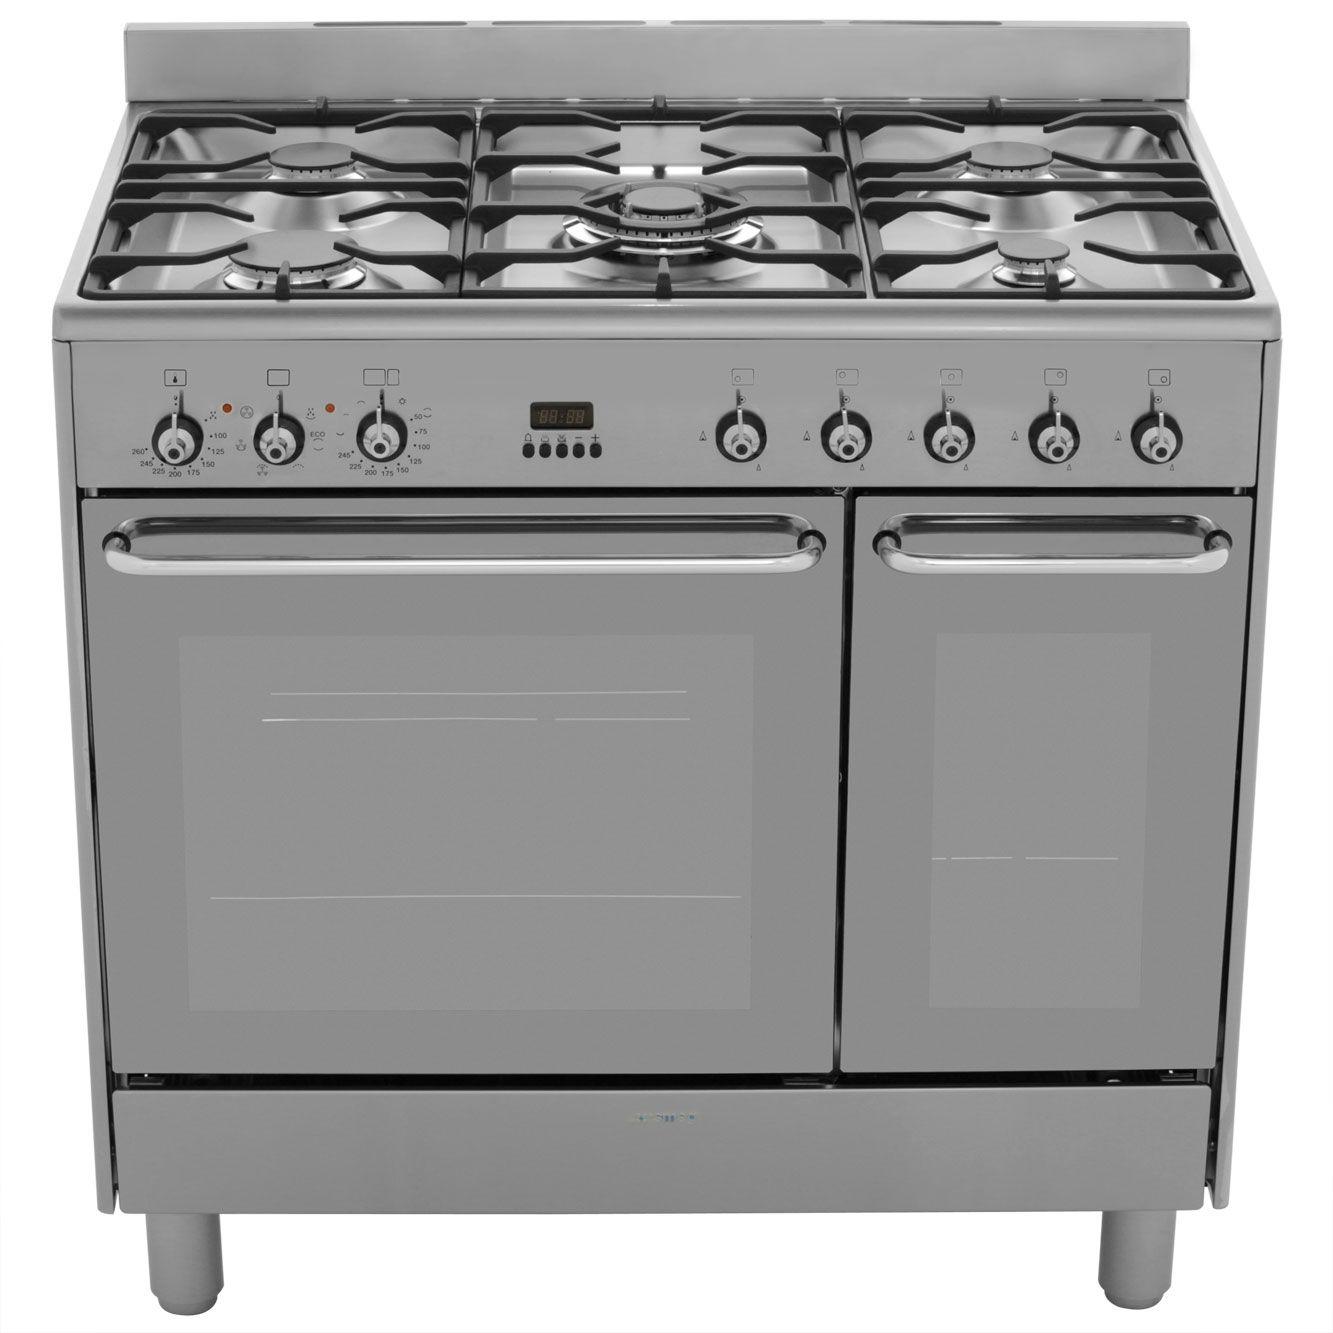 Smeg CG92X9 90cm Dual Fuel Range Cooker - Stainless Steel